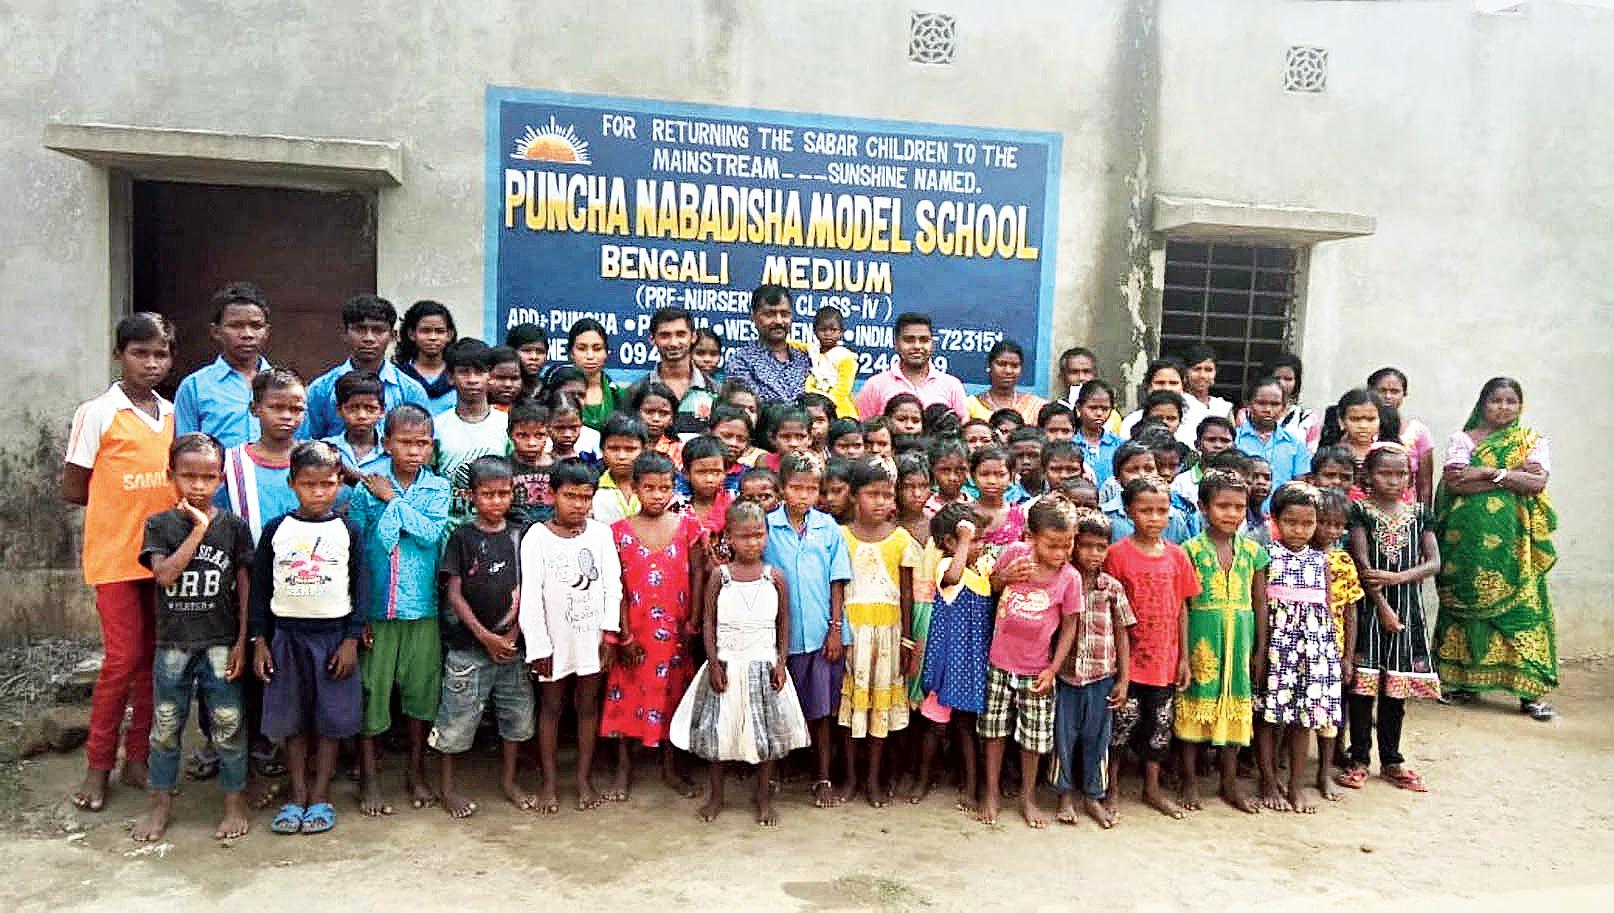 Students and staff of Puncha Nabadisha Model School outside the school building.